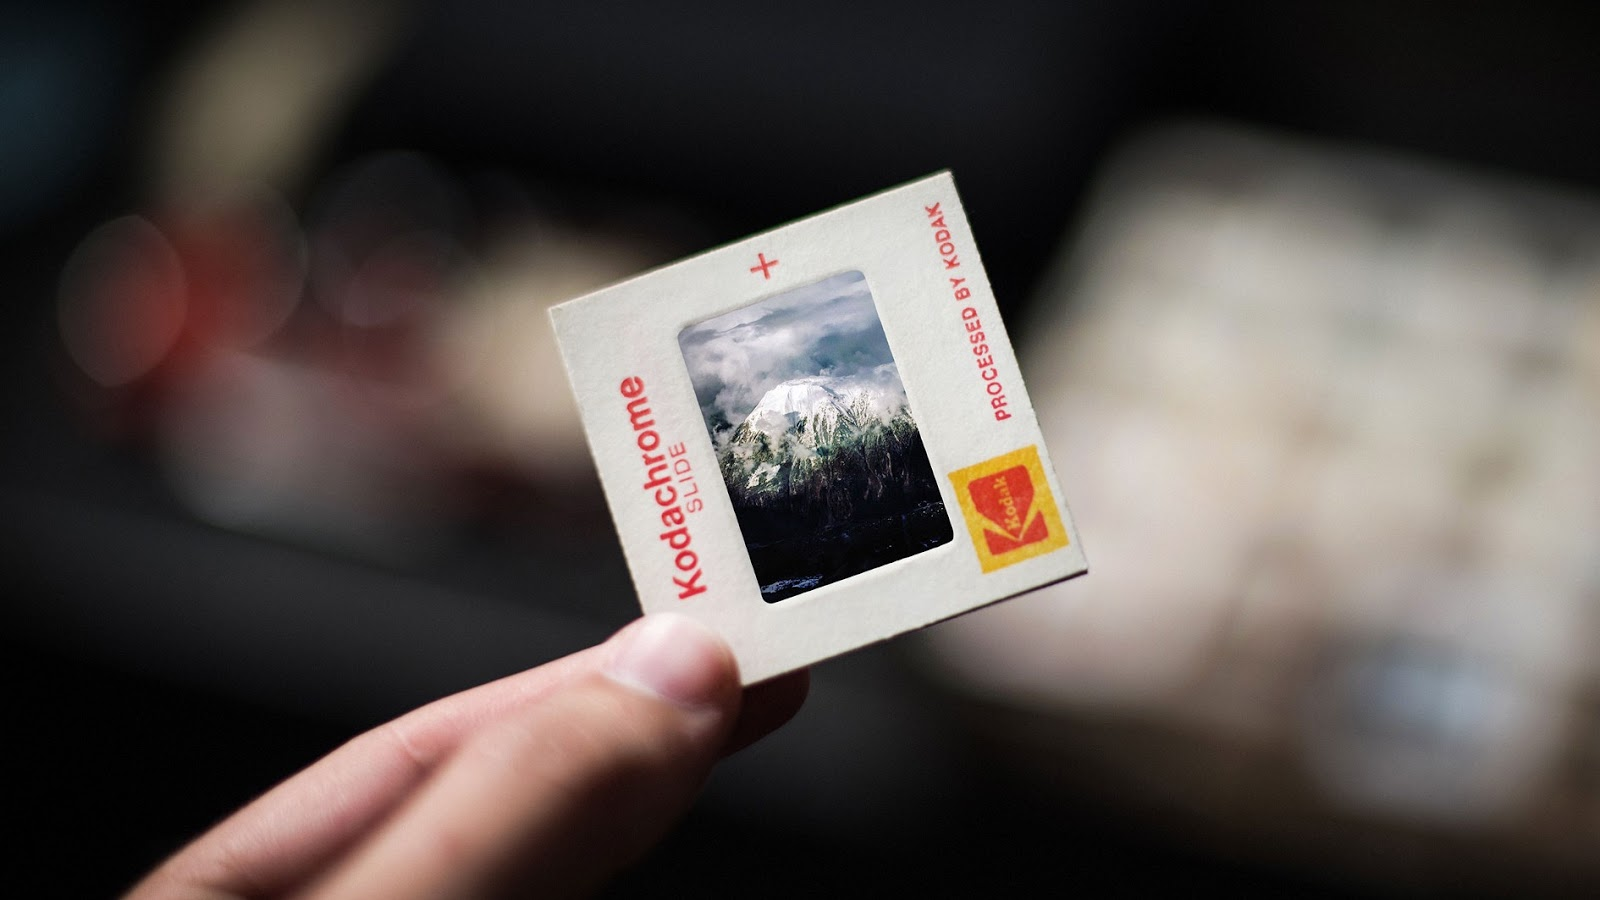 Слайд Kodakchrome, фотограф Натан Андерсон